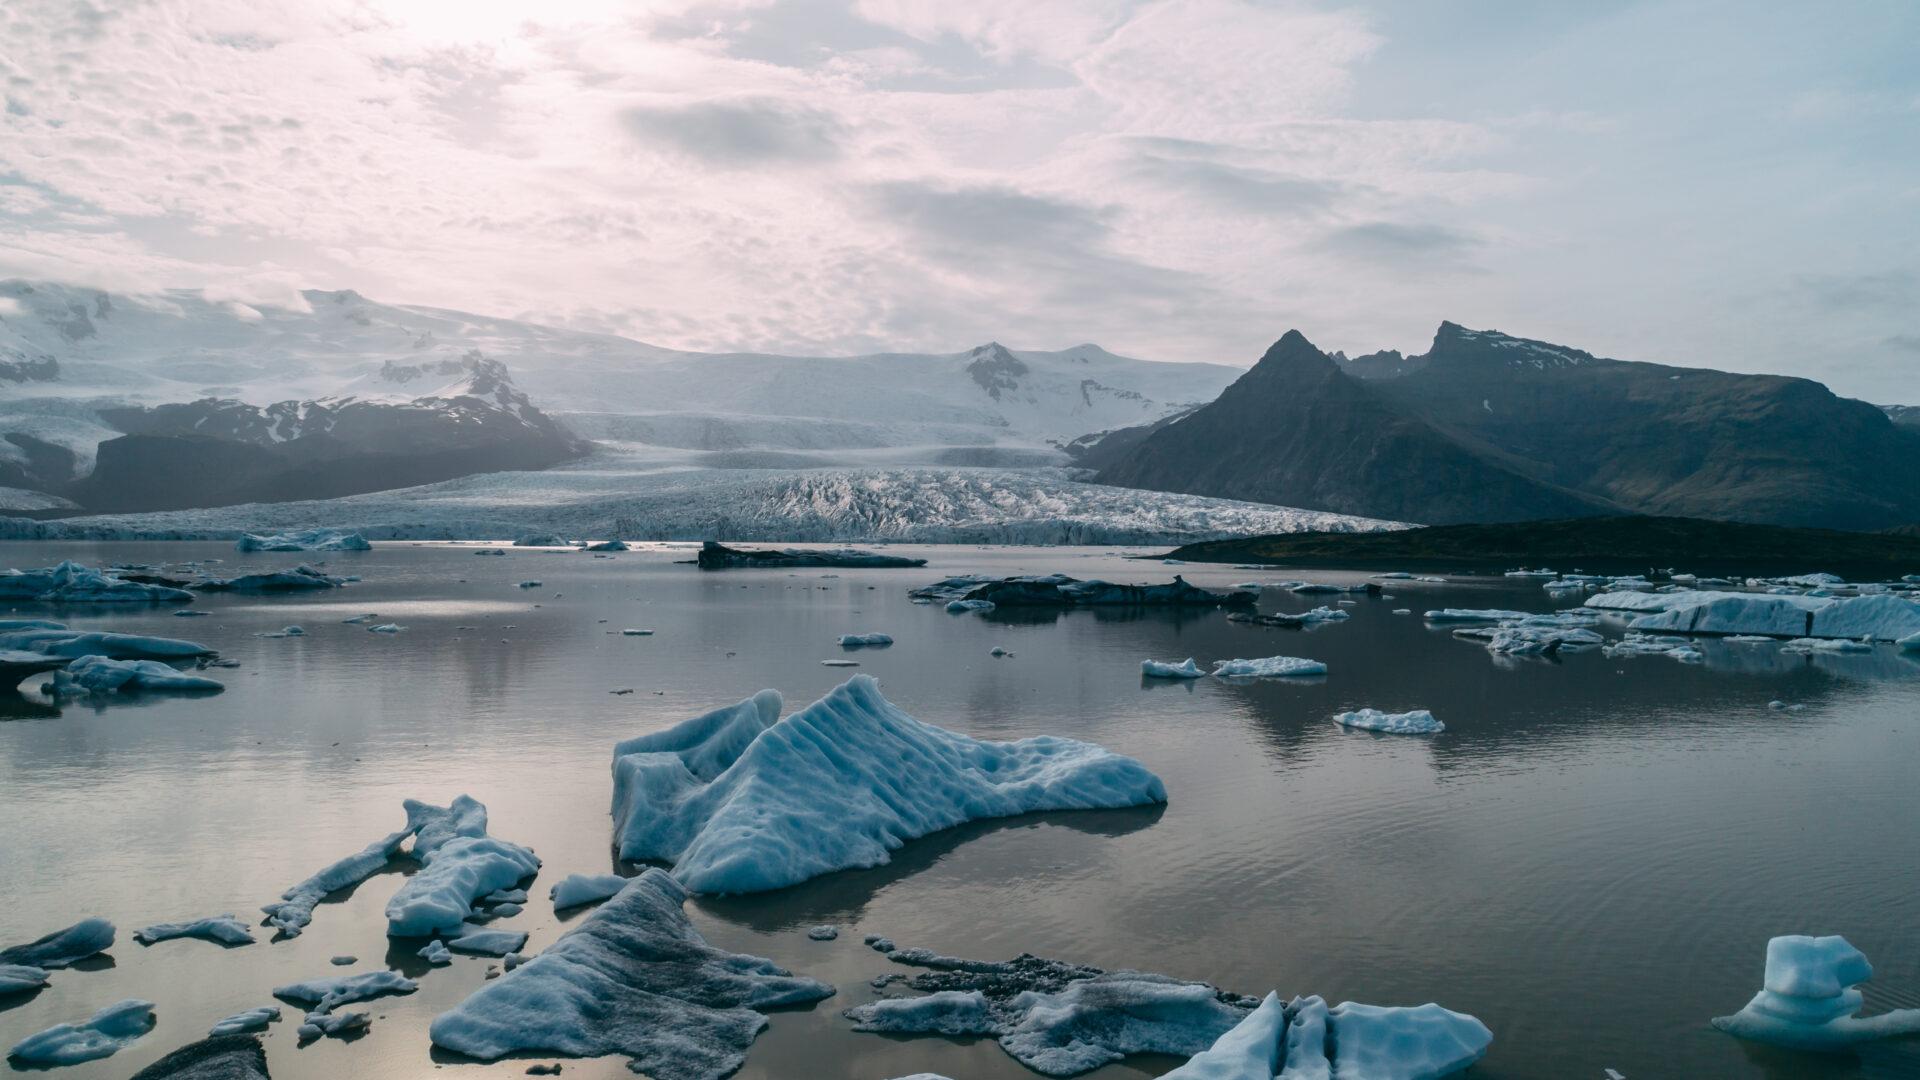 Tirpsta ledynai